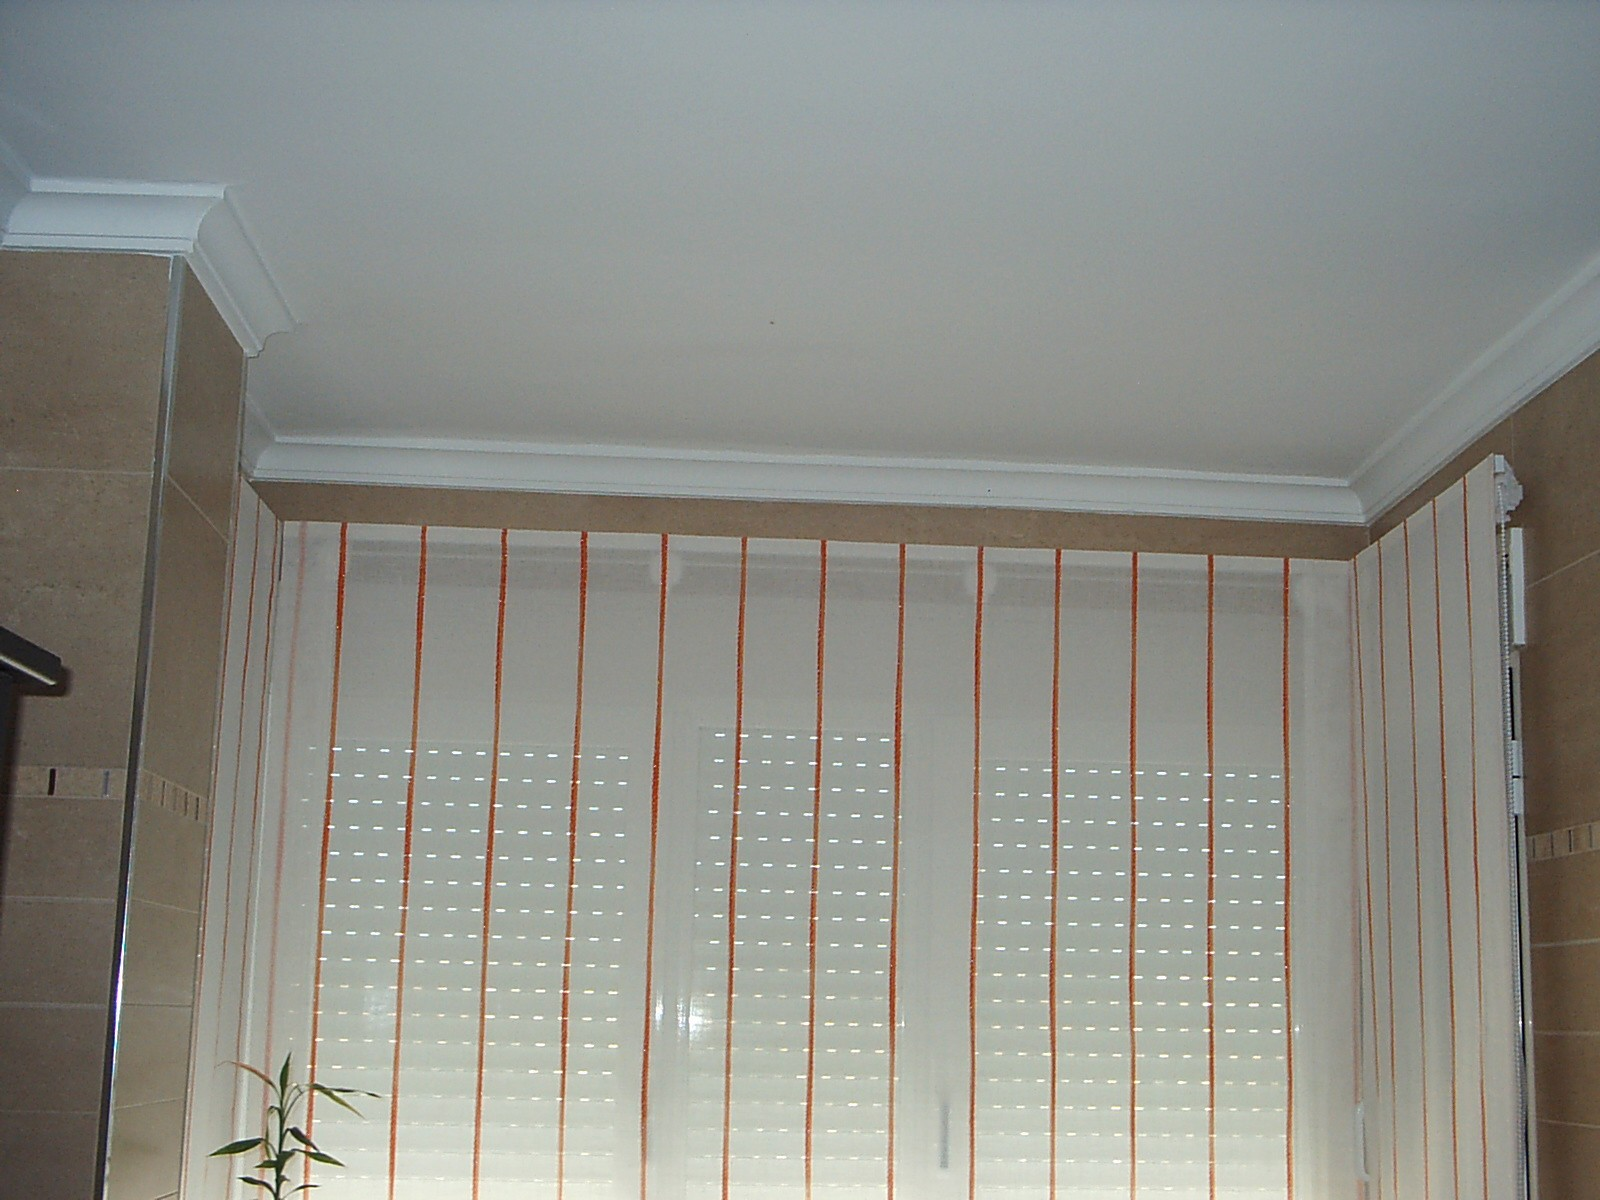 Dormitorio Muebles Modernos Cortinas Para Miradores